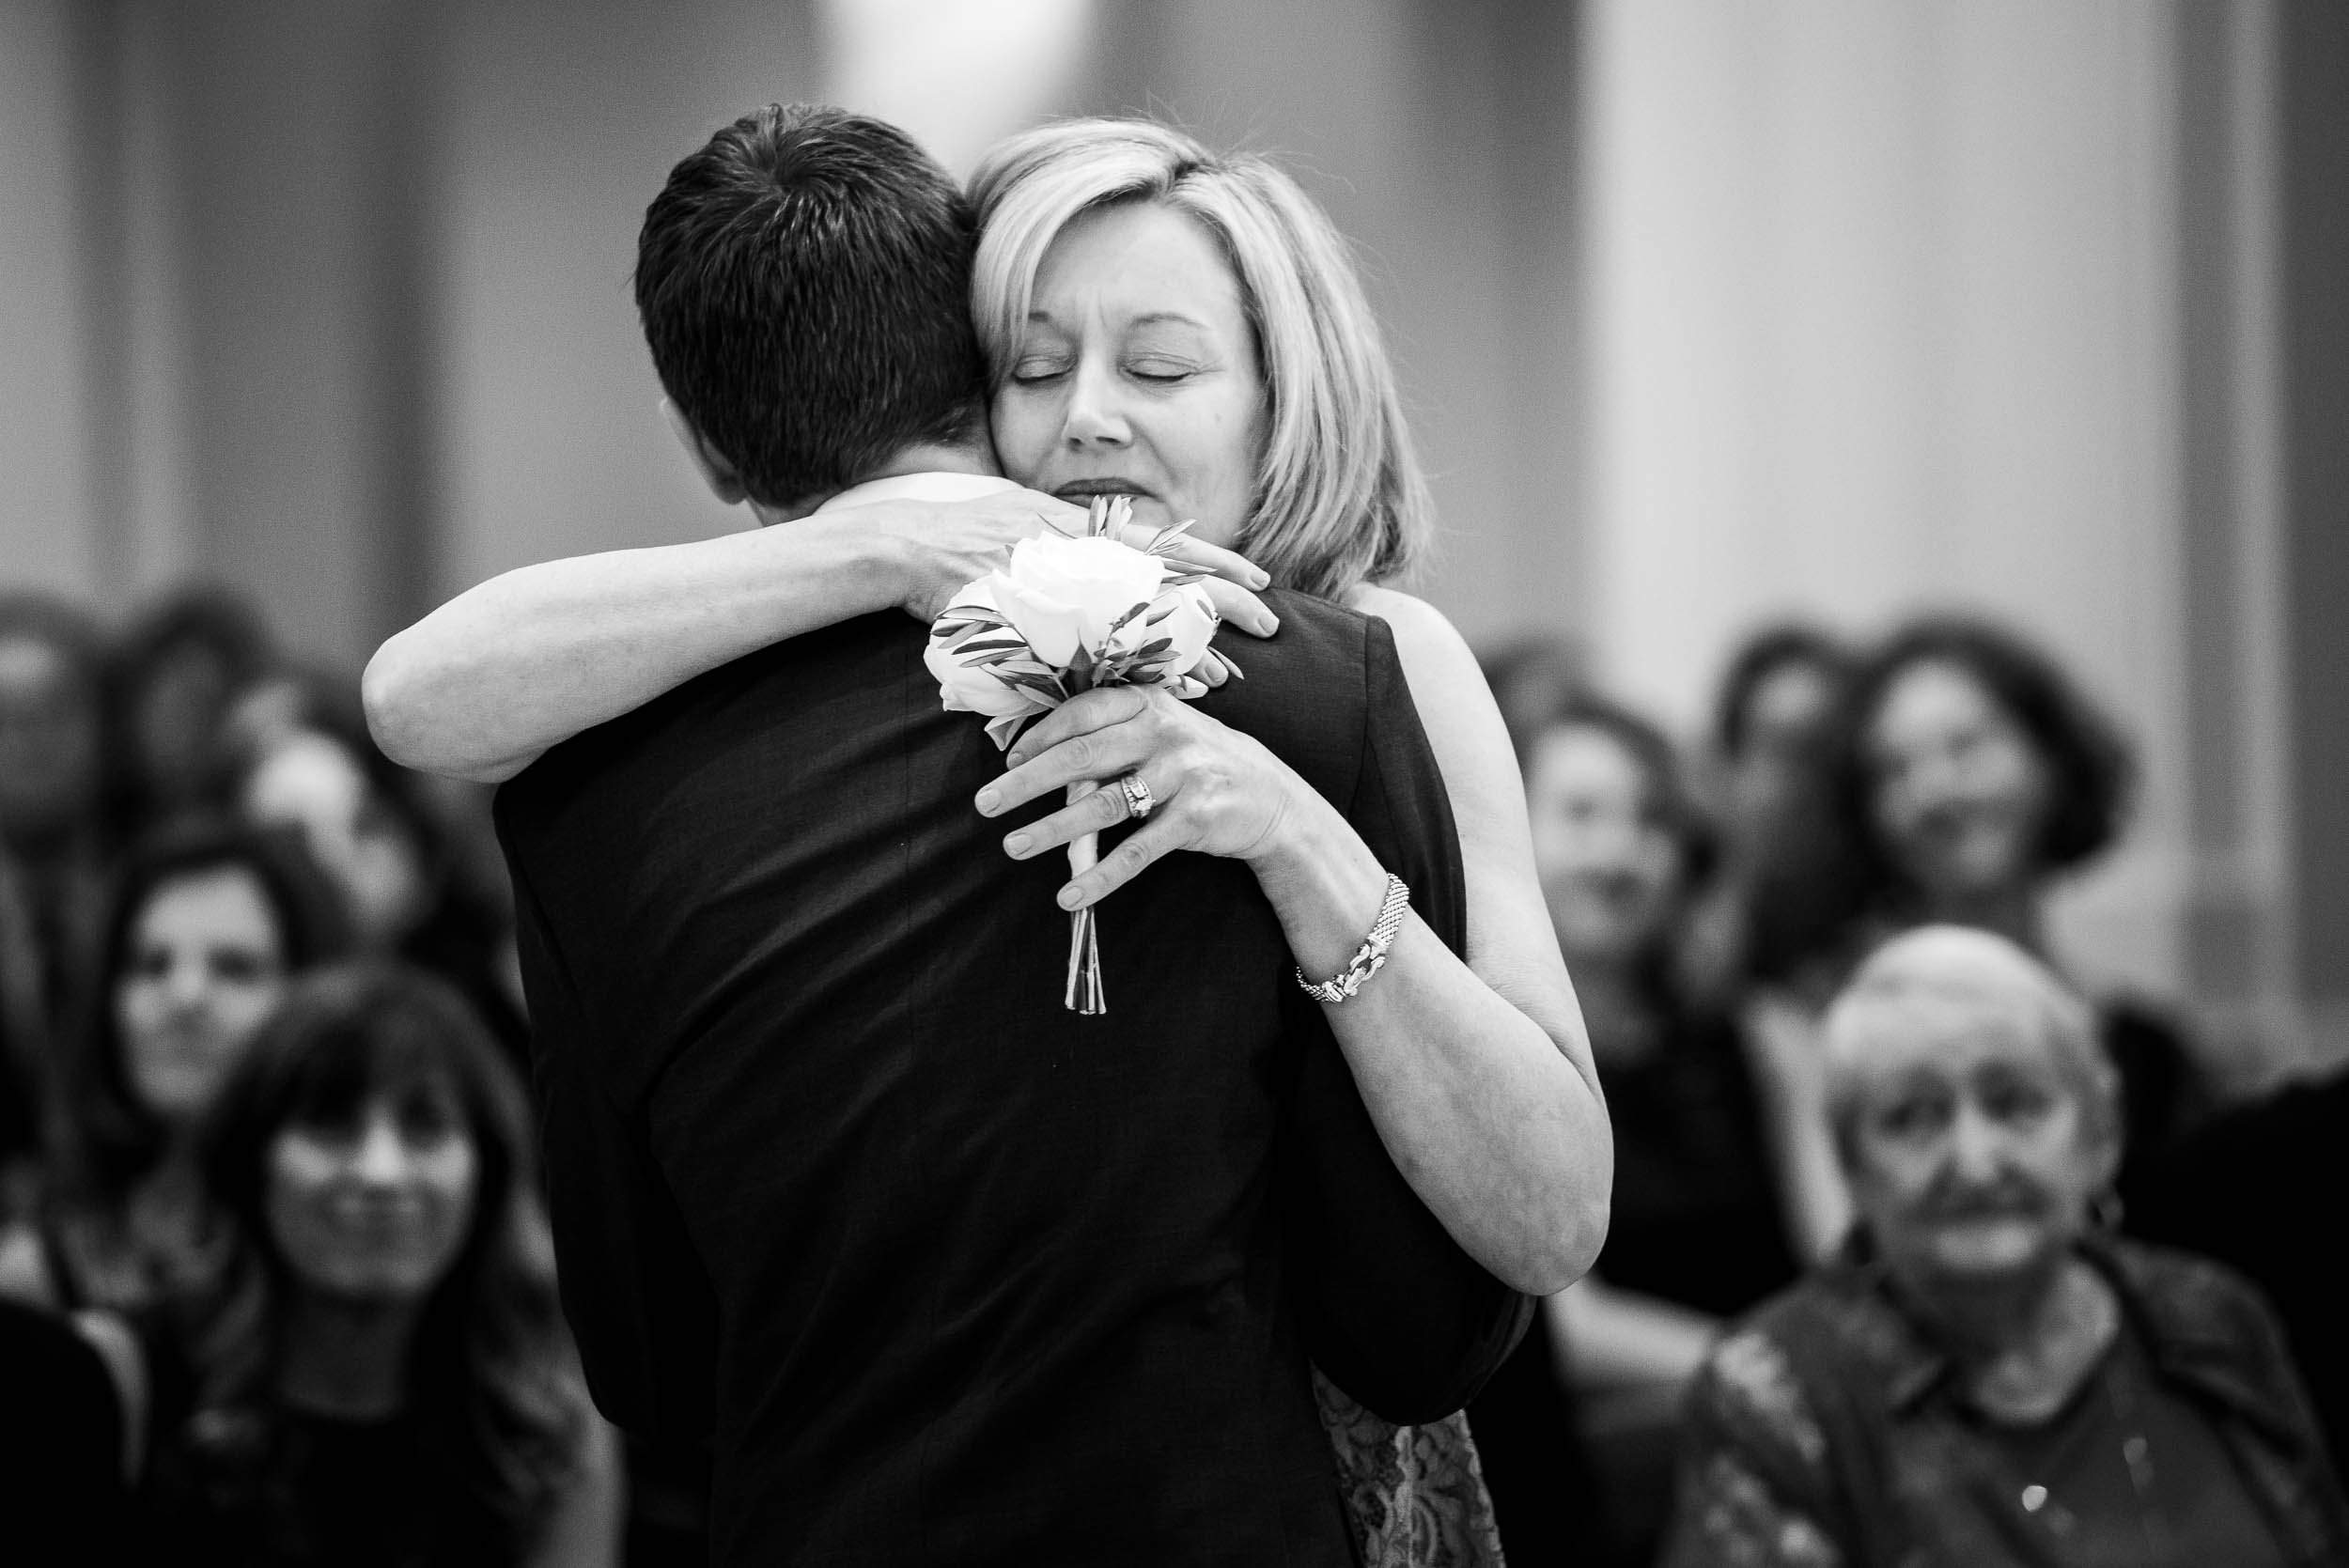 Mother and groom hug during a wedding ceremony at Madonna Della Strada.